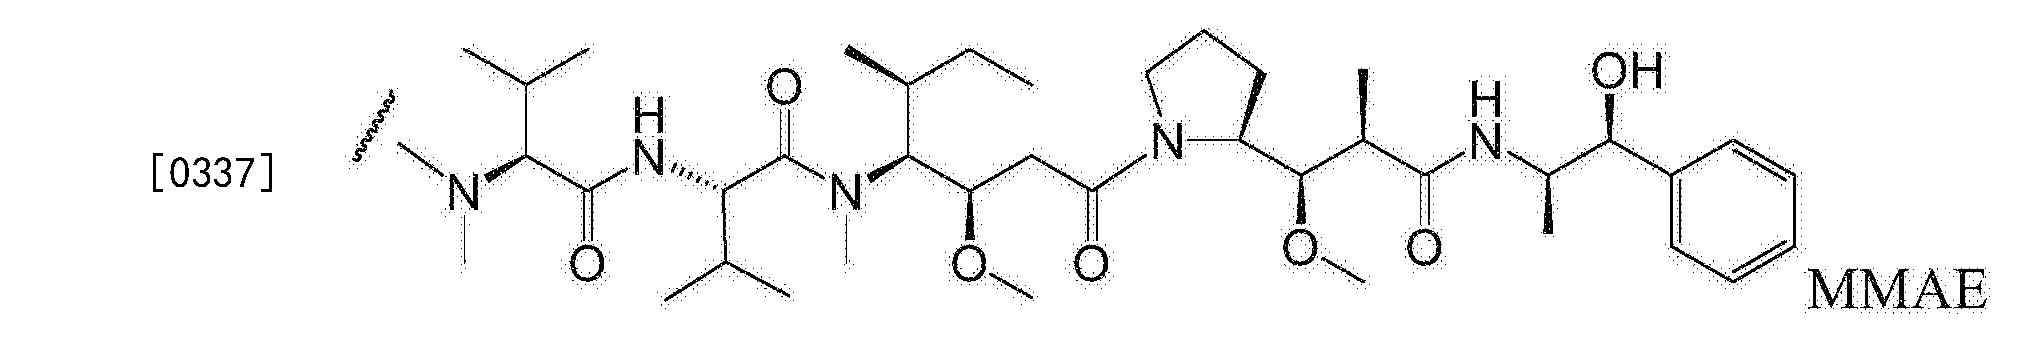 Figure CN106413756AD00451